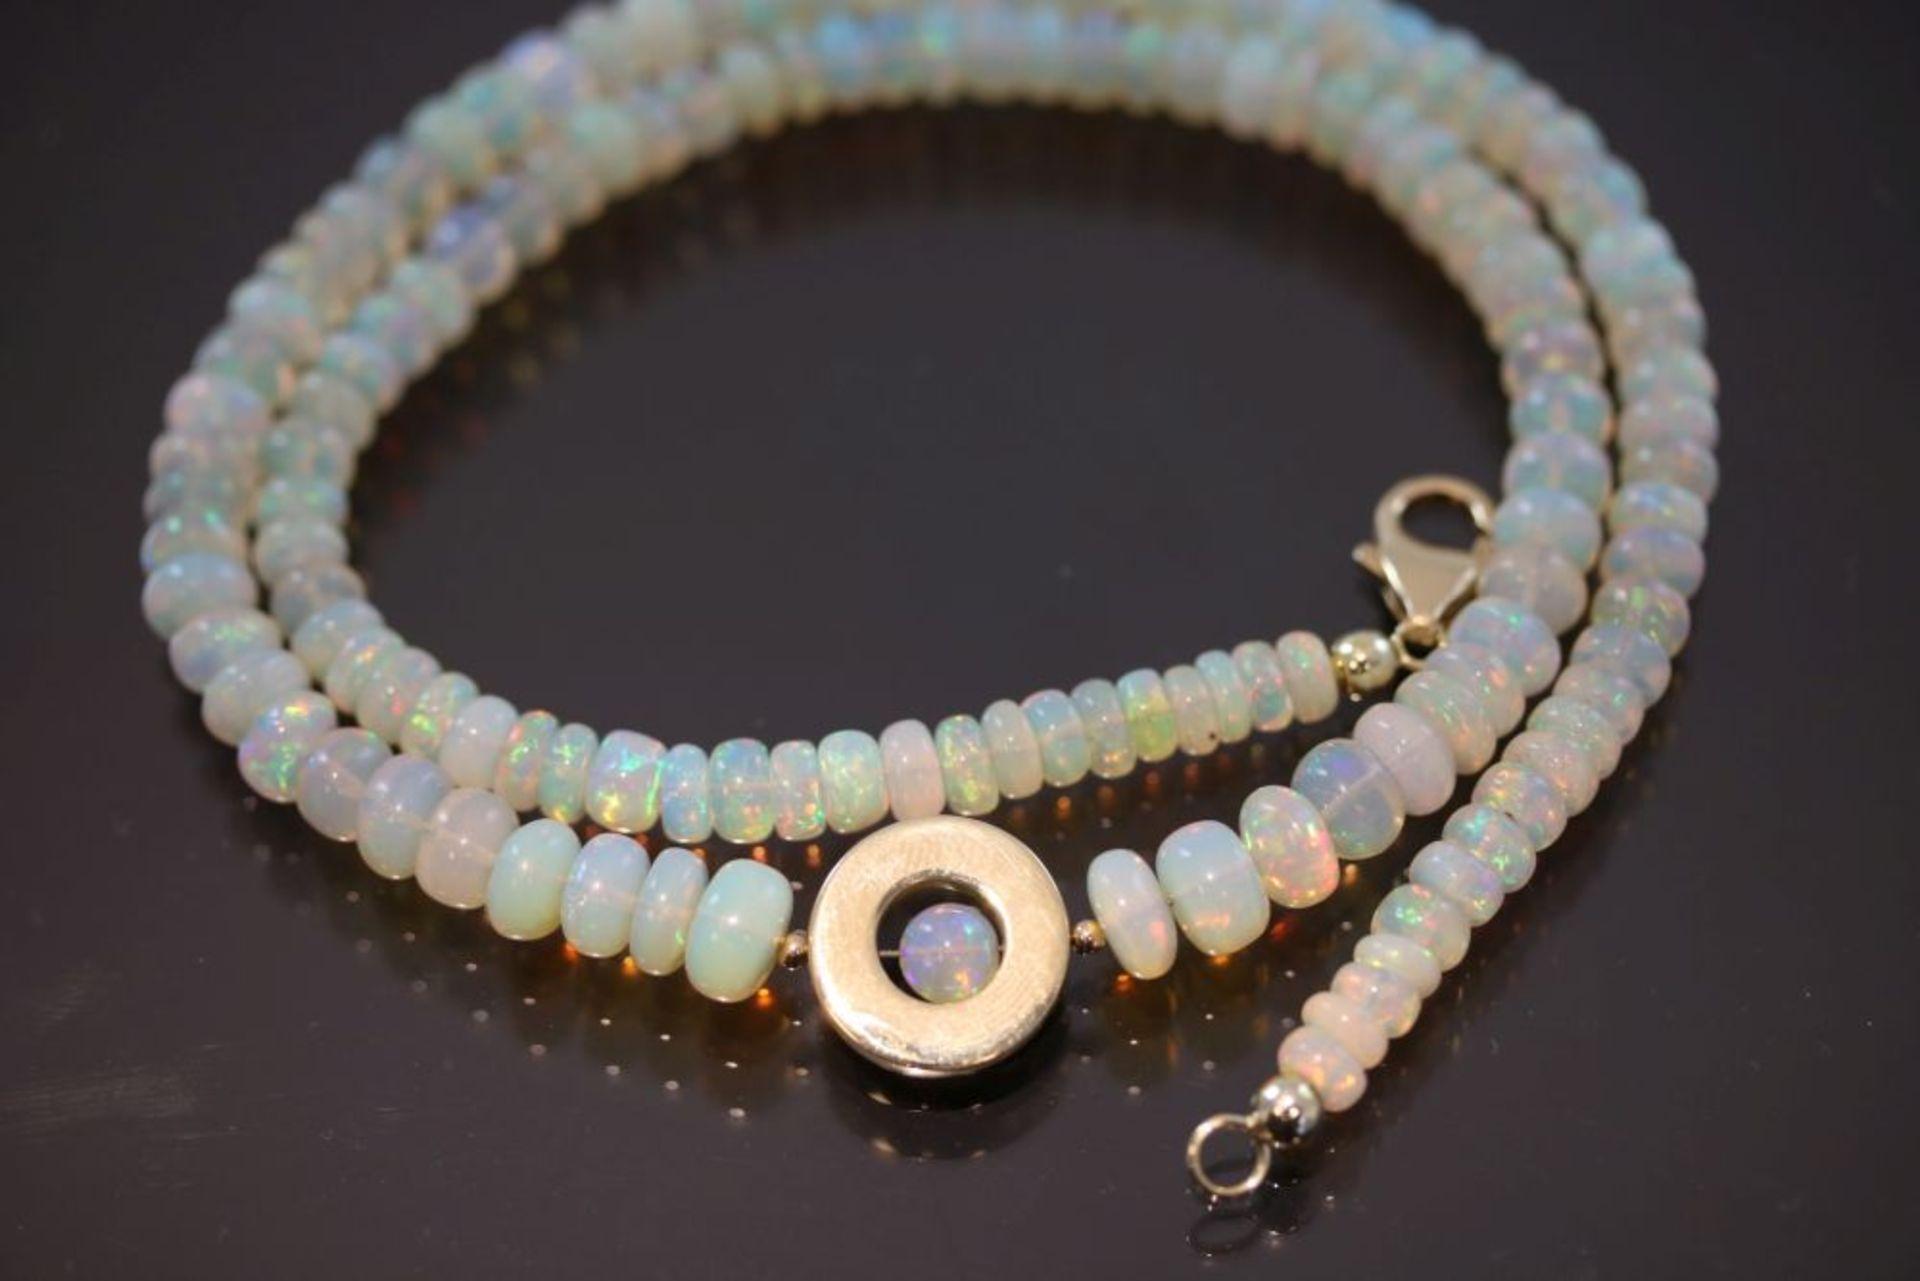 Opal-Collier, 585 Gold - Bild 2 aus 3